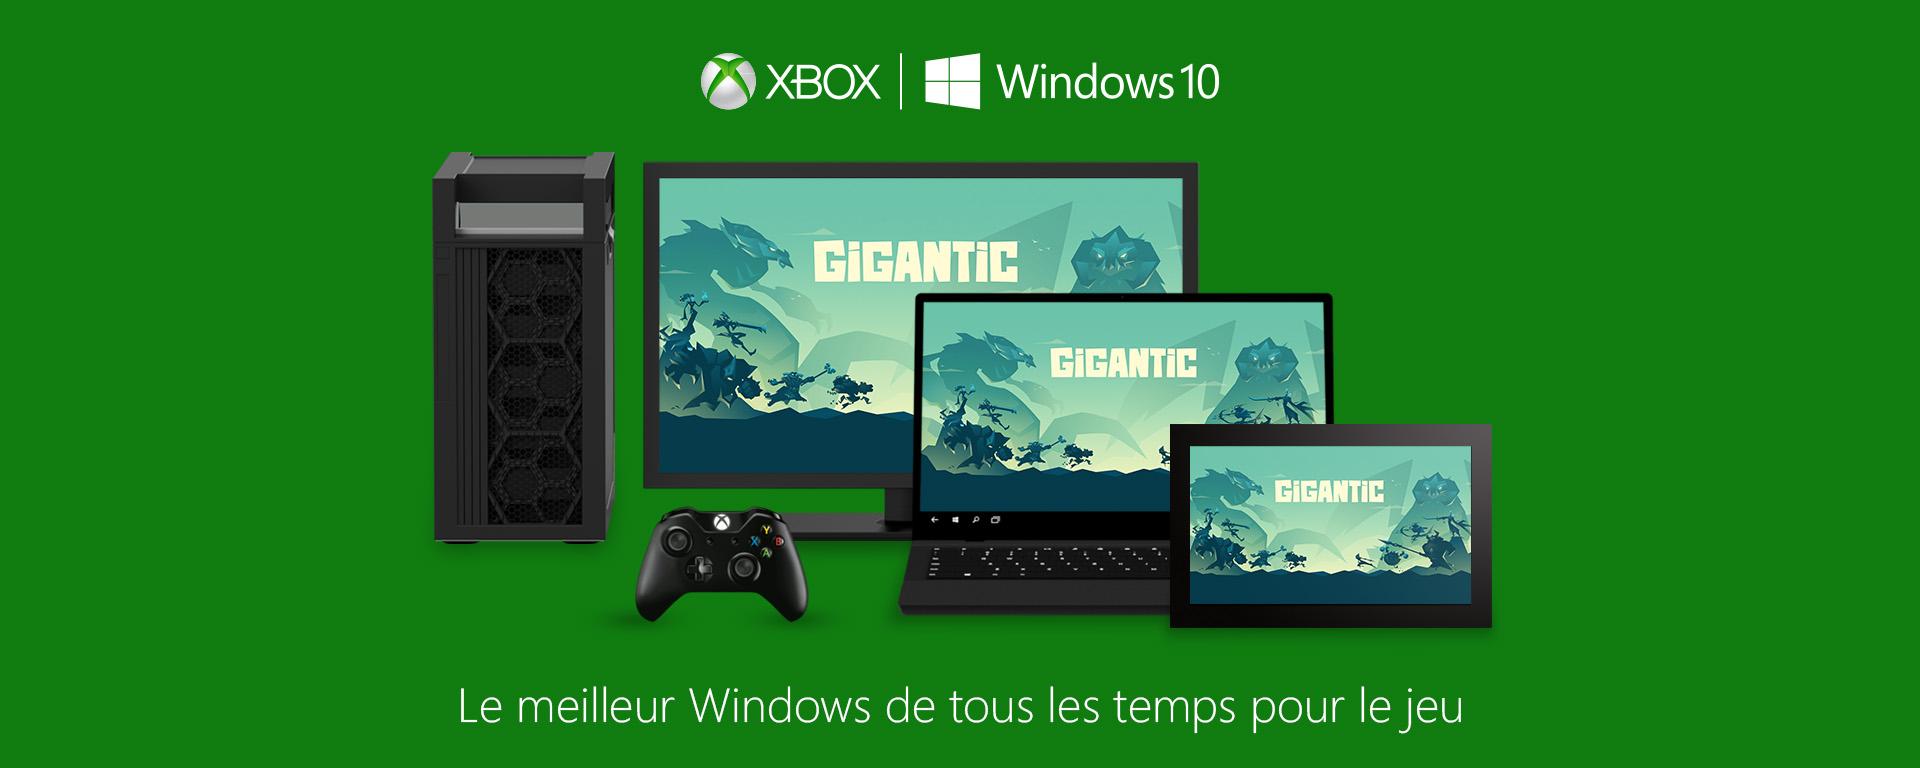 Windows 10 | Xbox